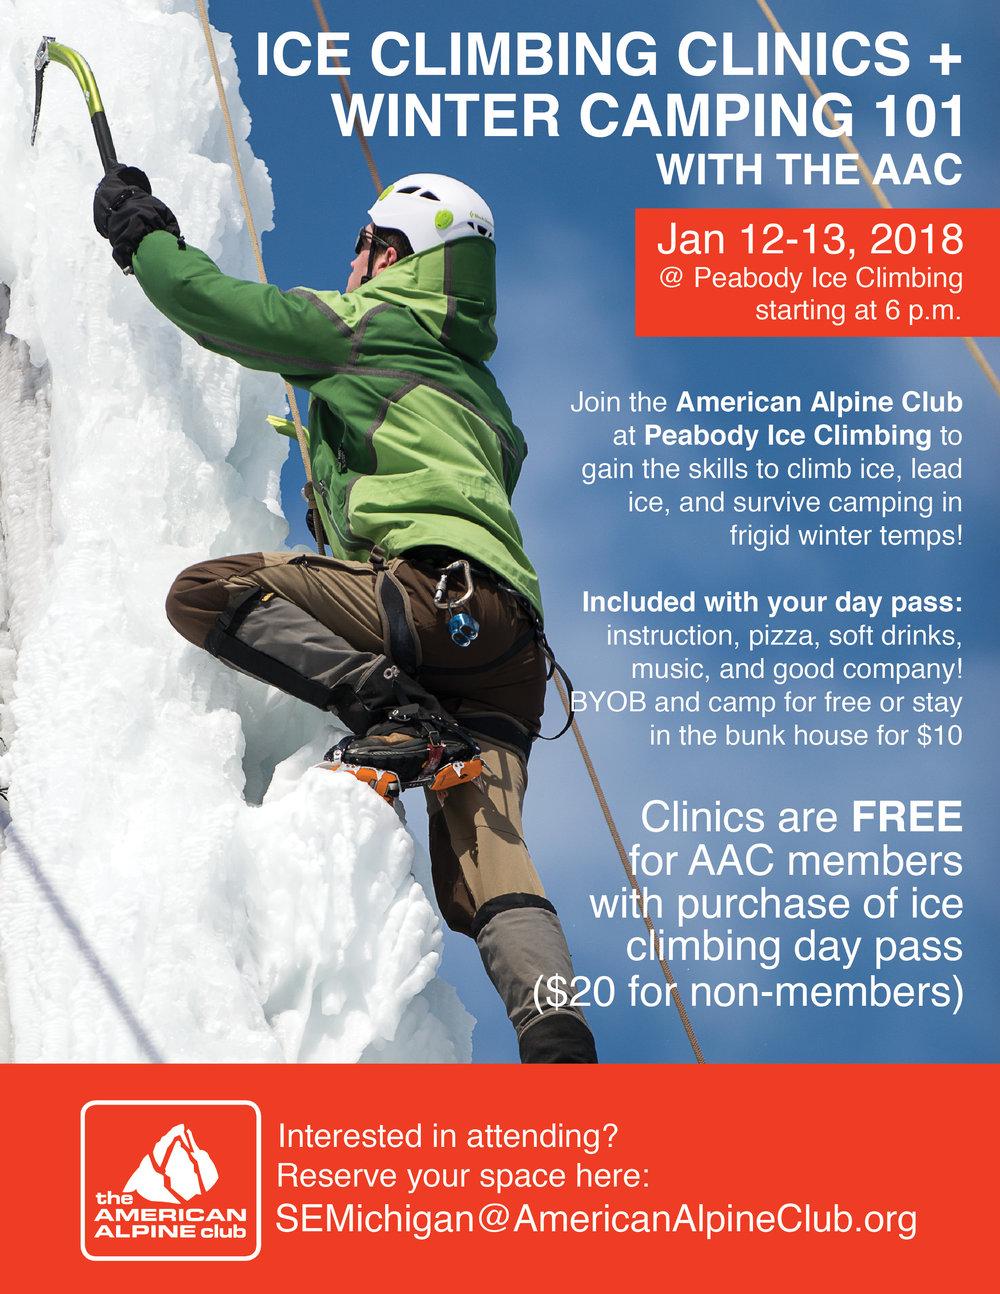 America Alpince Club clinics